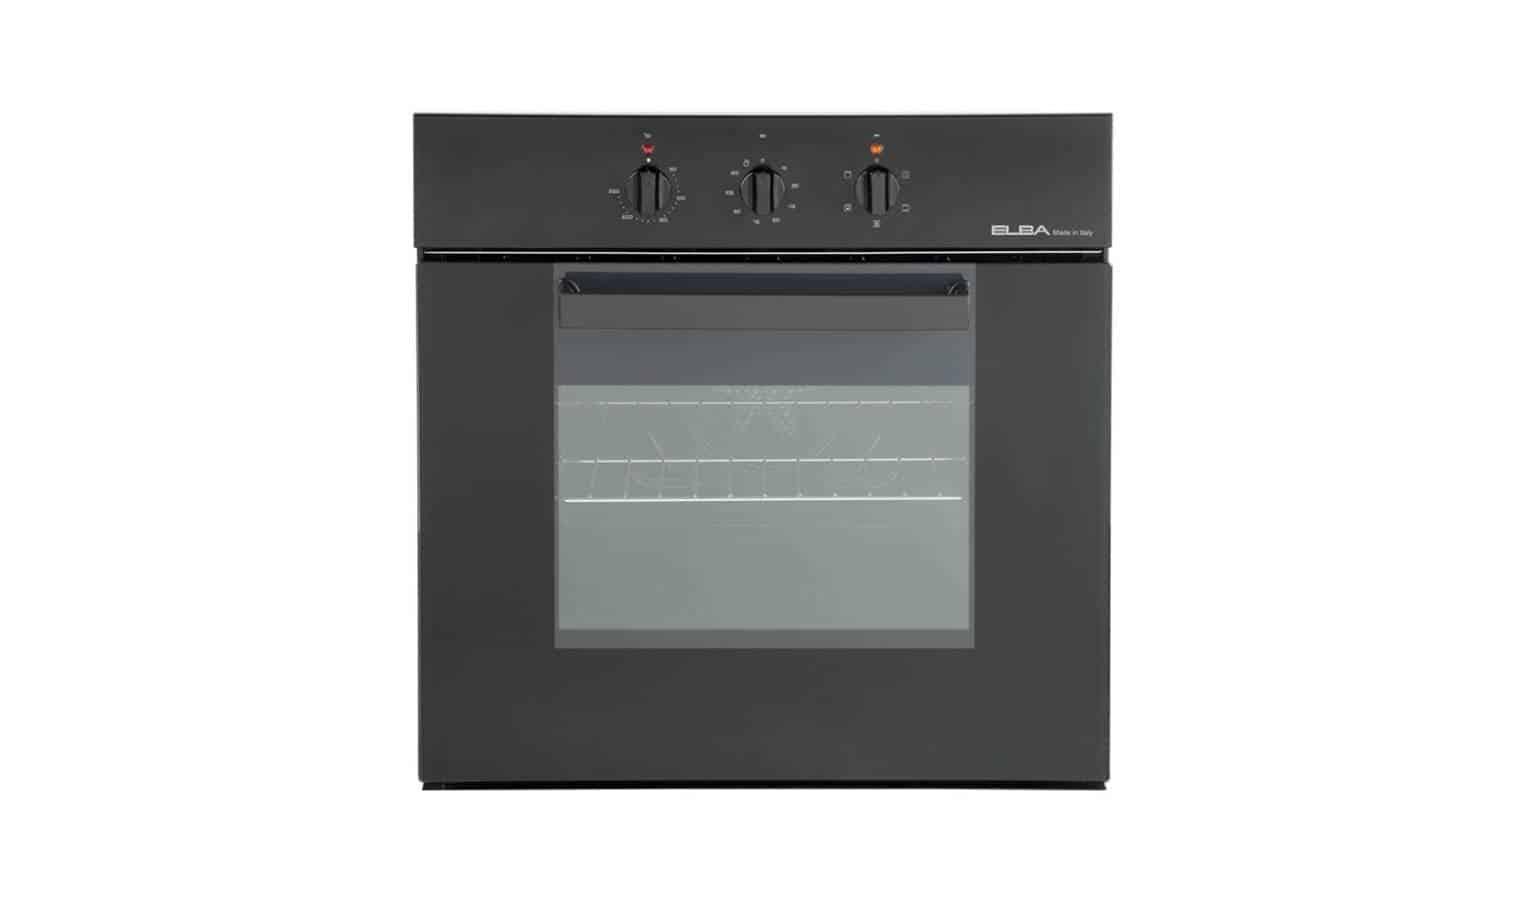 Elba EBO 1726 Built-in Oven - Black | Harvey Norman Singapore